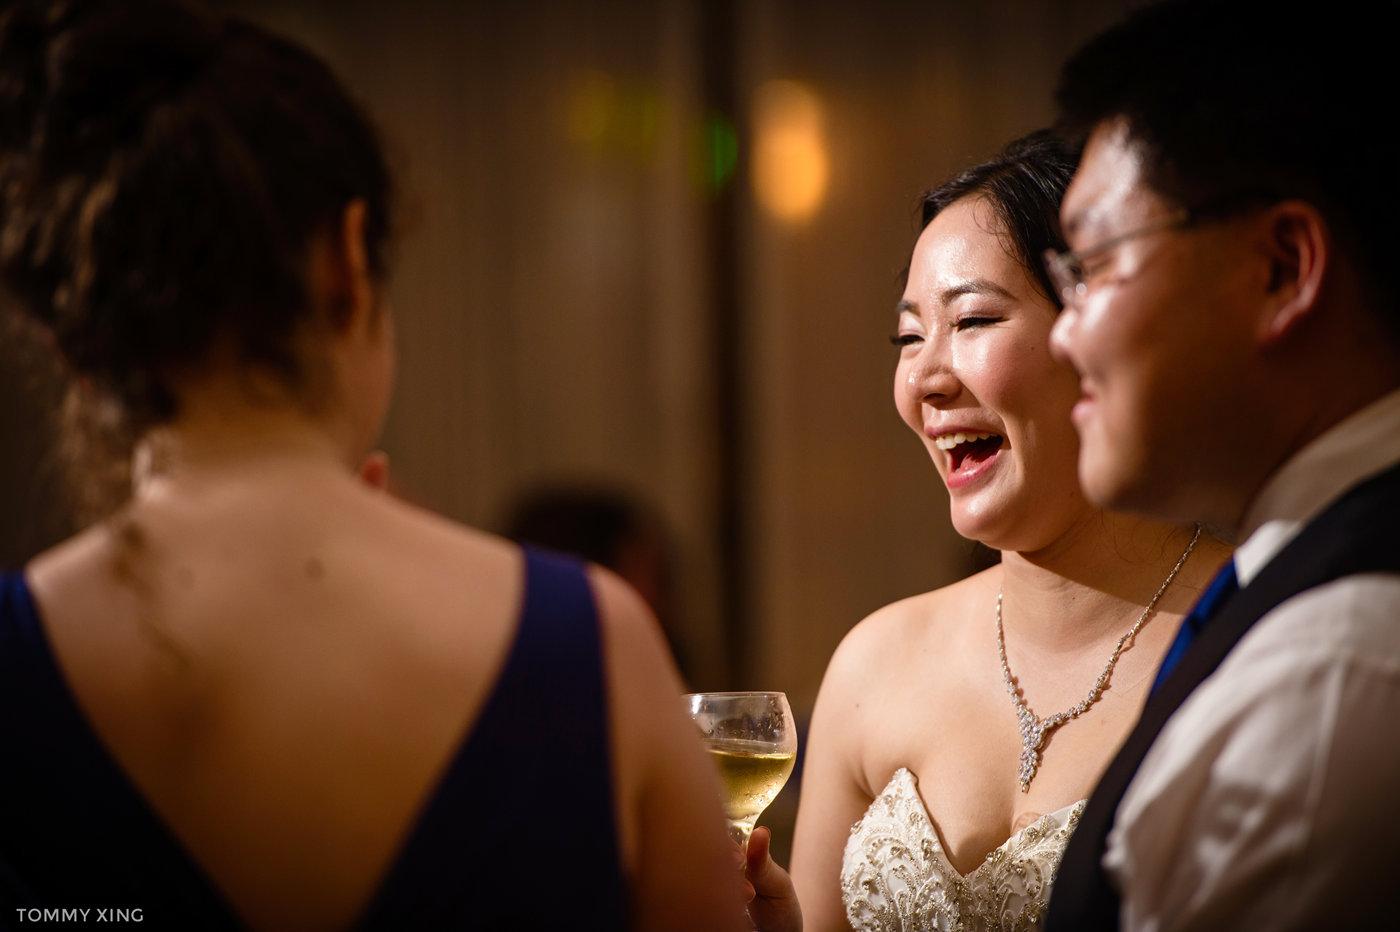 STANFORD MEMORIAL CHURCH WEDDING - Wenjie & Chengcheng - SAN FRANCISCO BAY AREA 斯坦福教堂婚礼跟拍 - 洛杉矶婚礼婚纱照摄影师 Tommy Xing Photography177.jpg